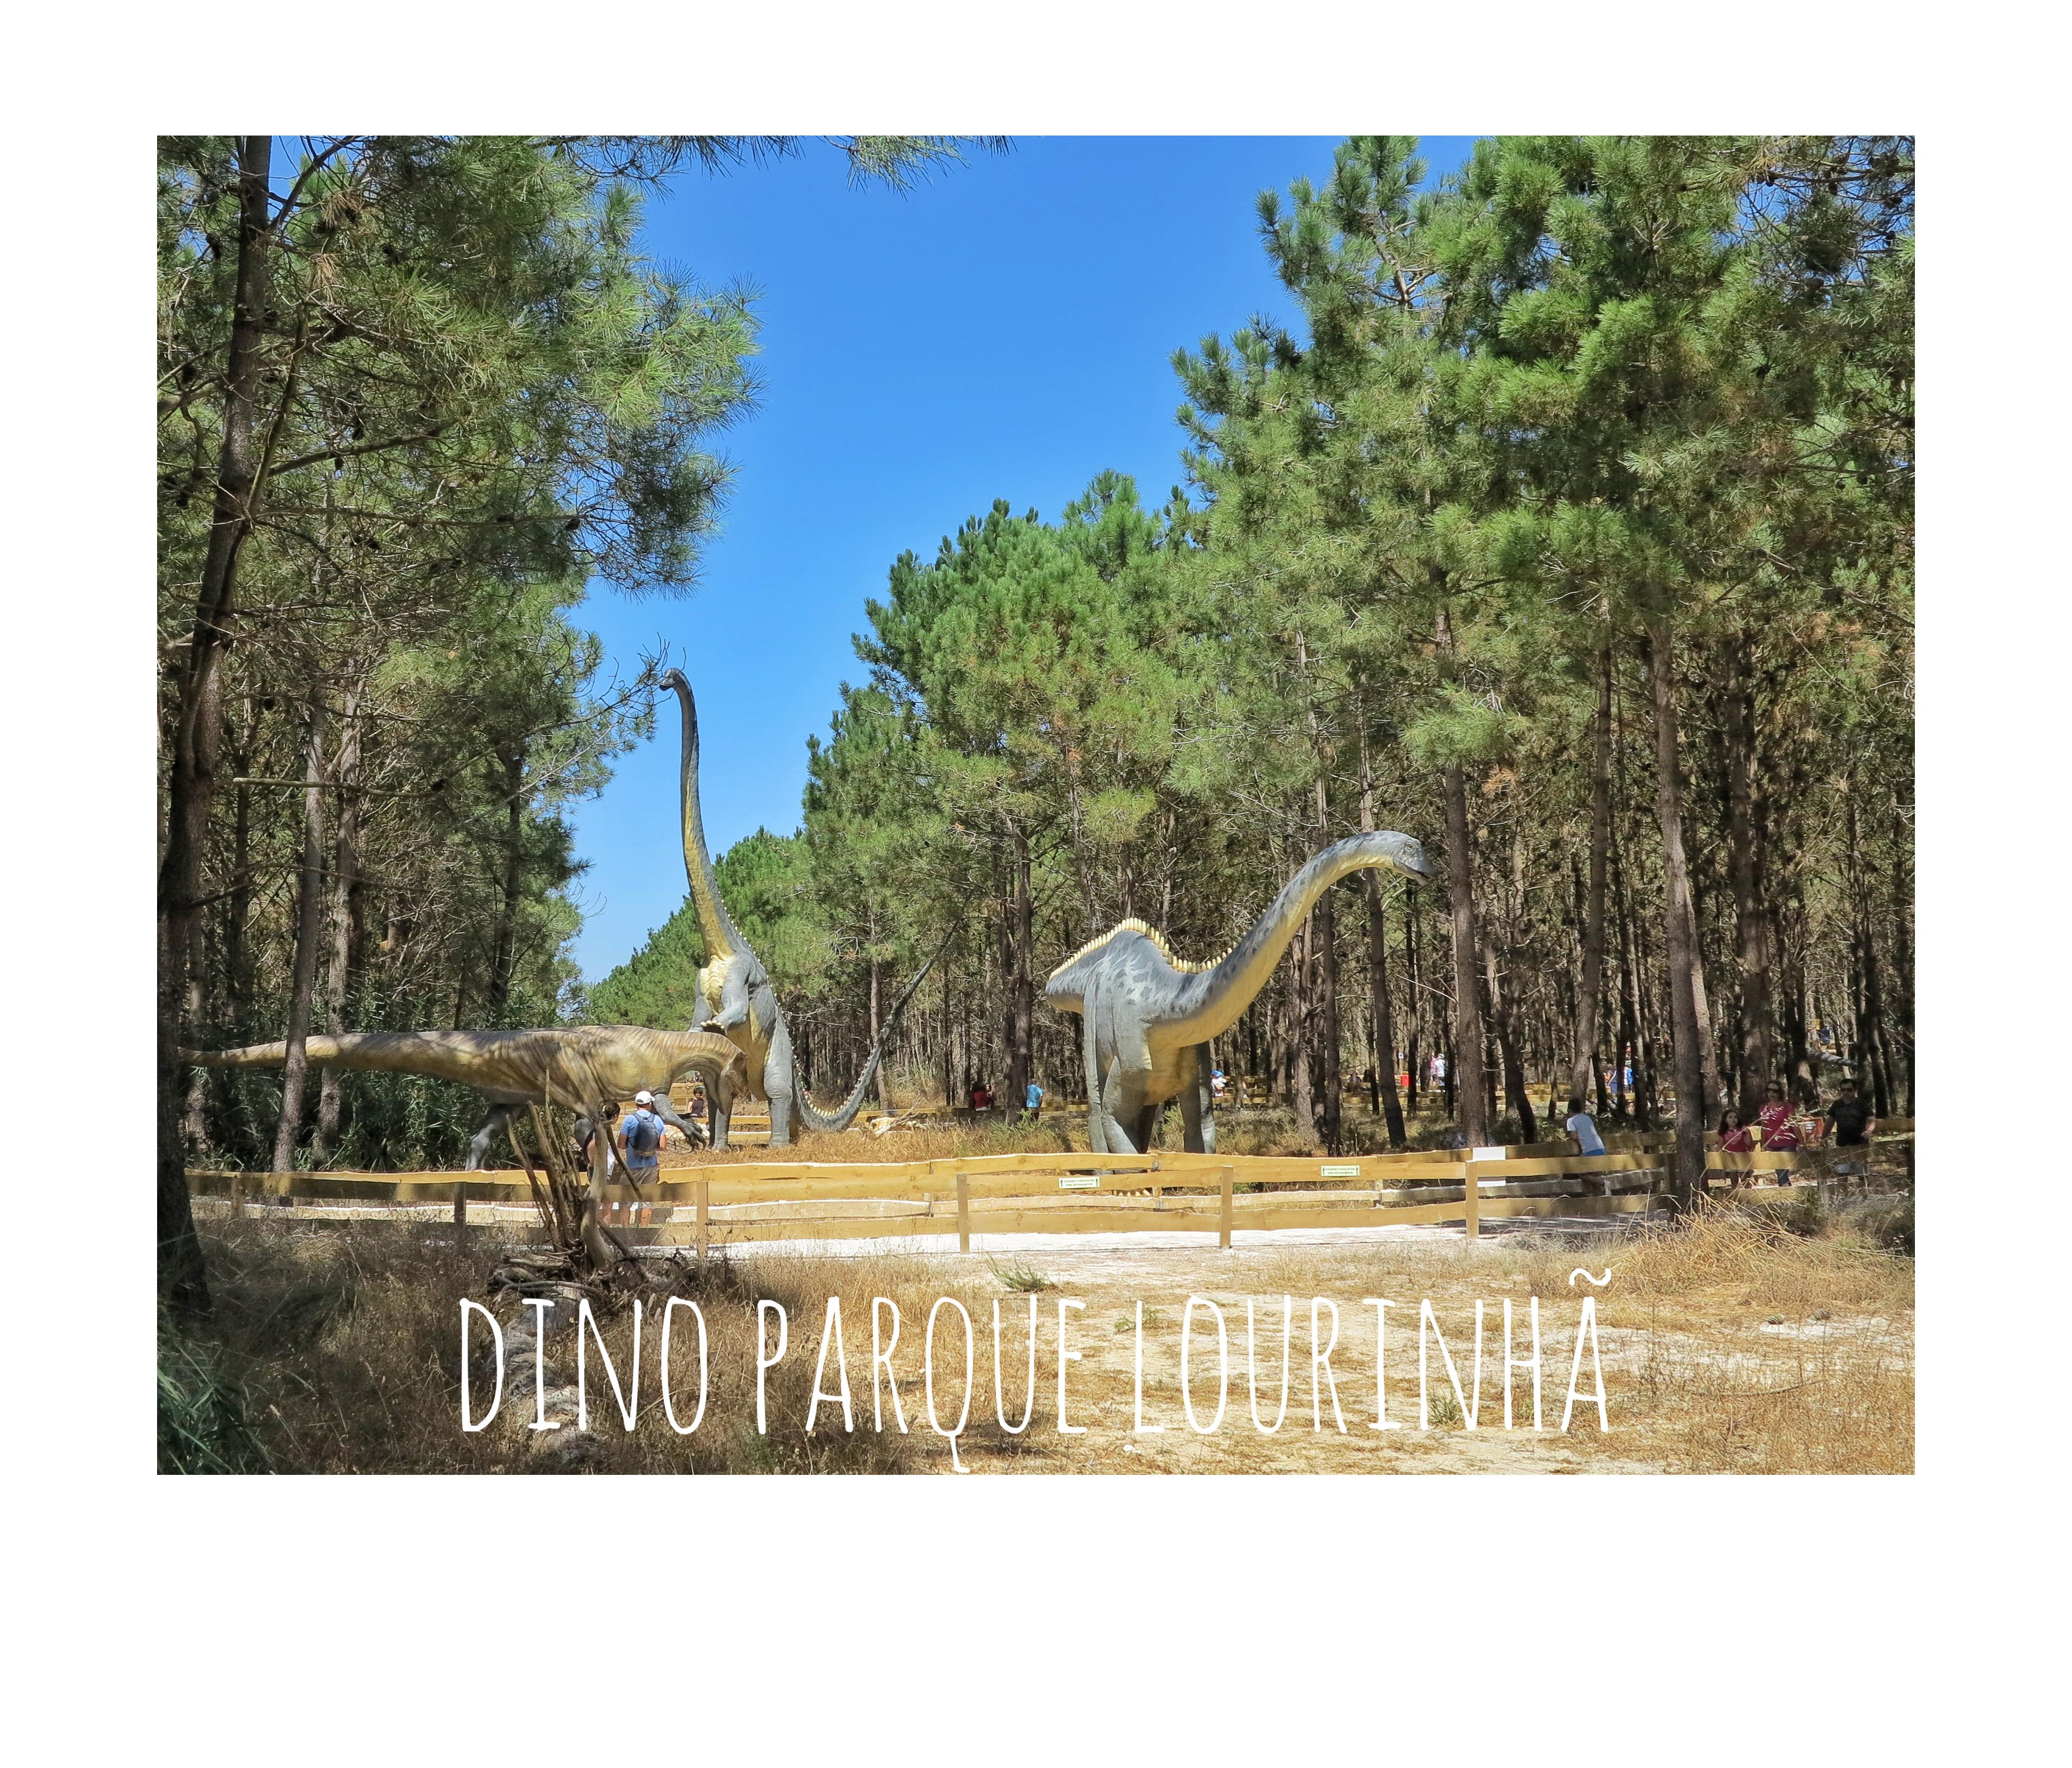 Tam gdzie buszują dinozaury – Dino Parque Lourinhã